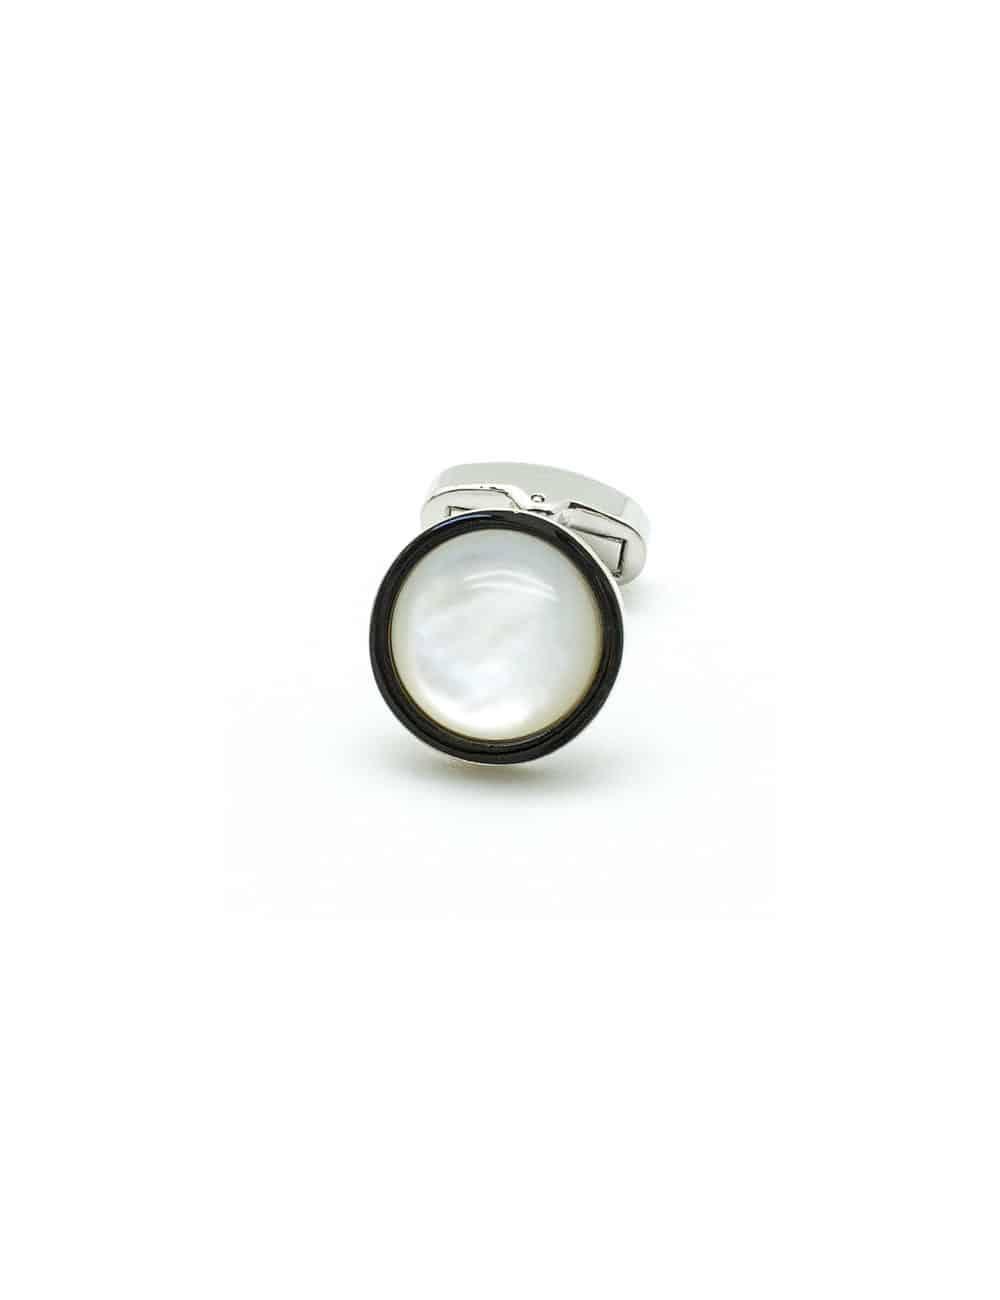 White Pearl Convex in Silver Round White Cufflink C131FP-085